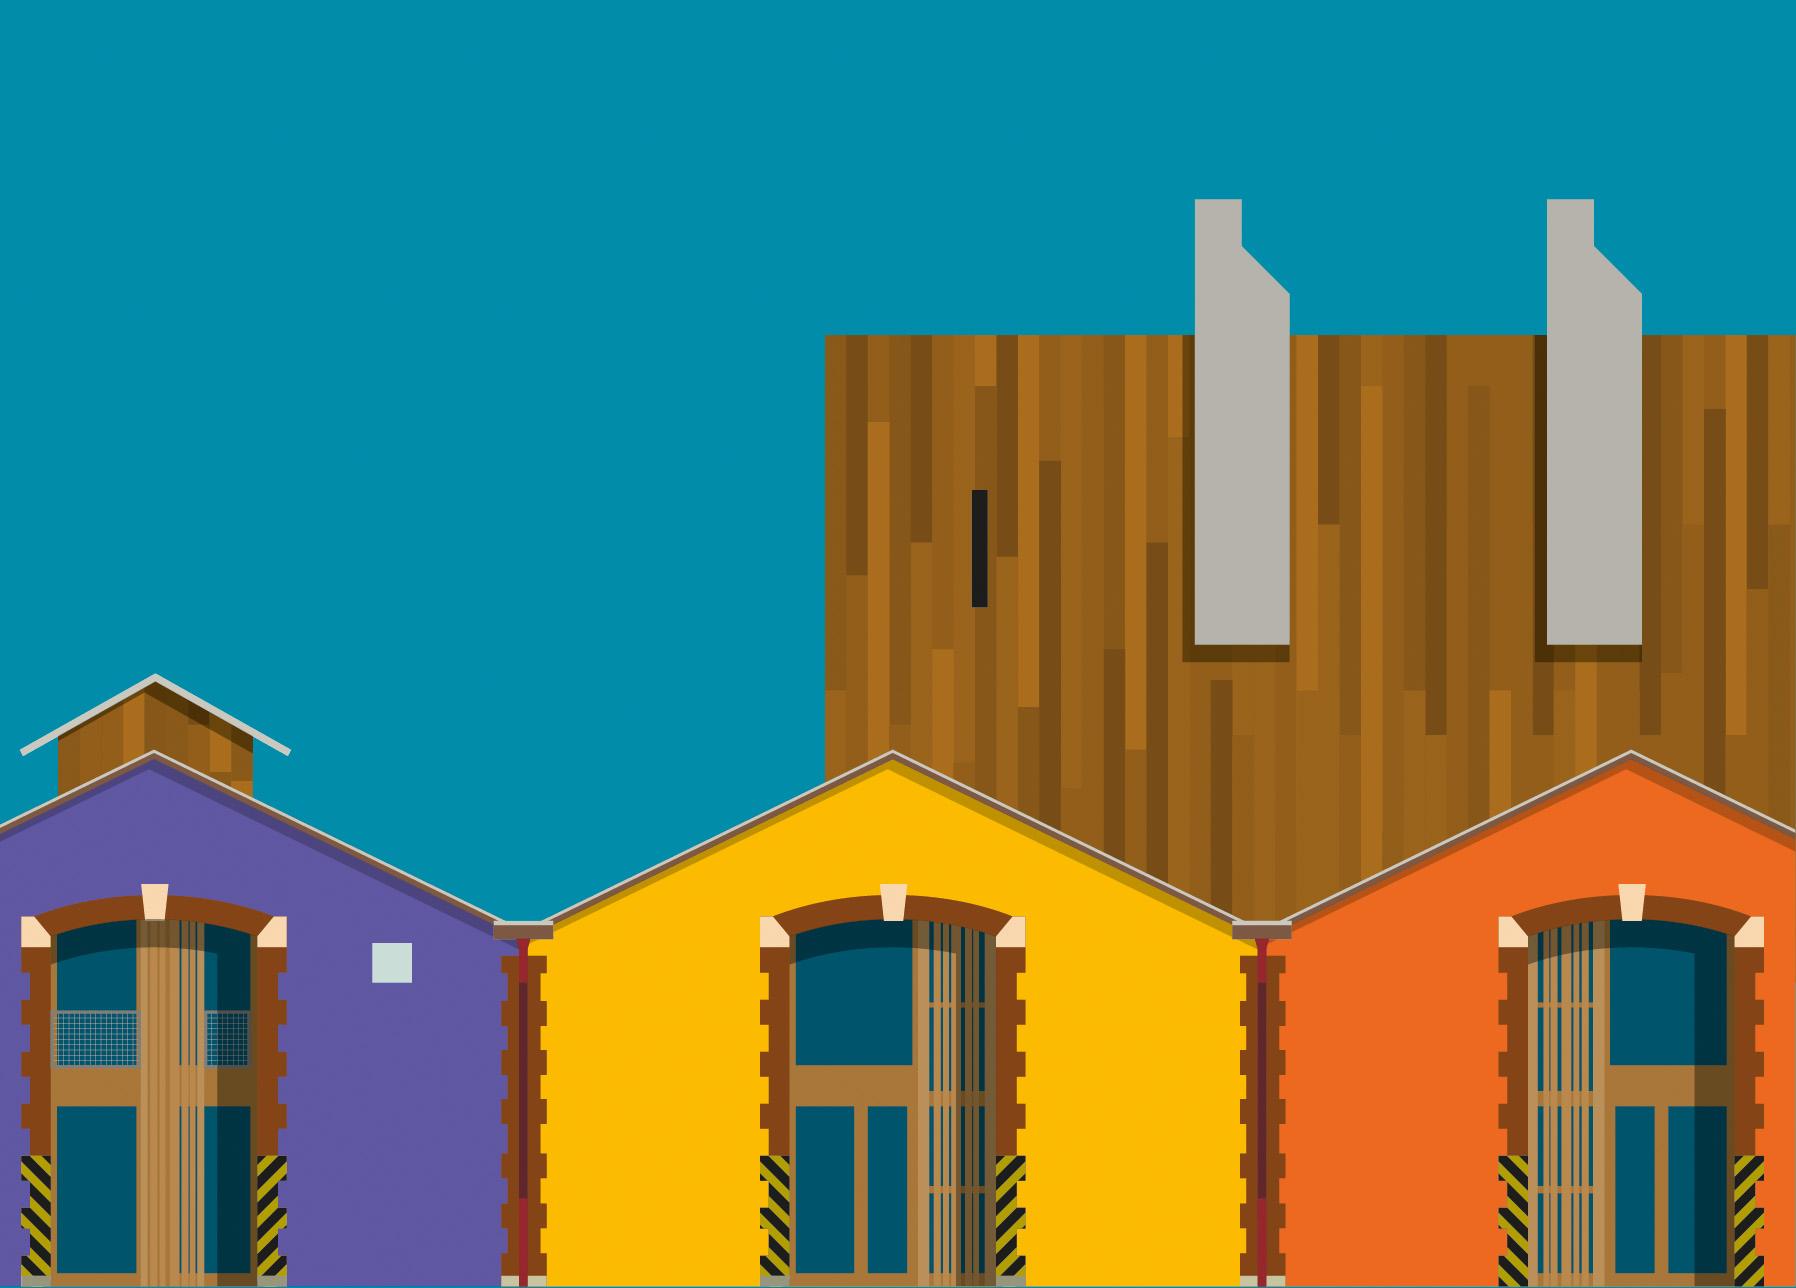 Architecture gersoise